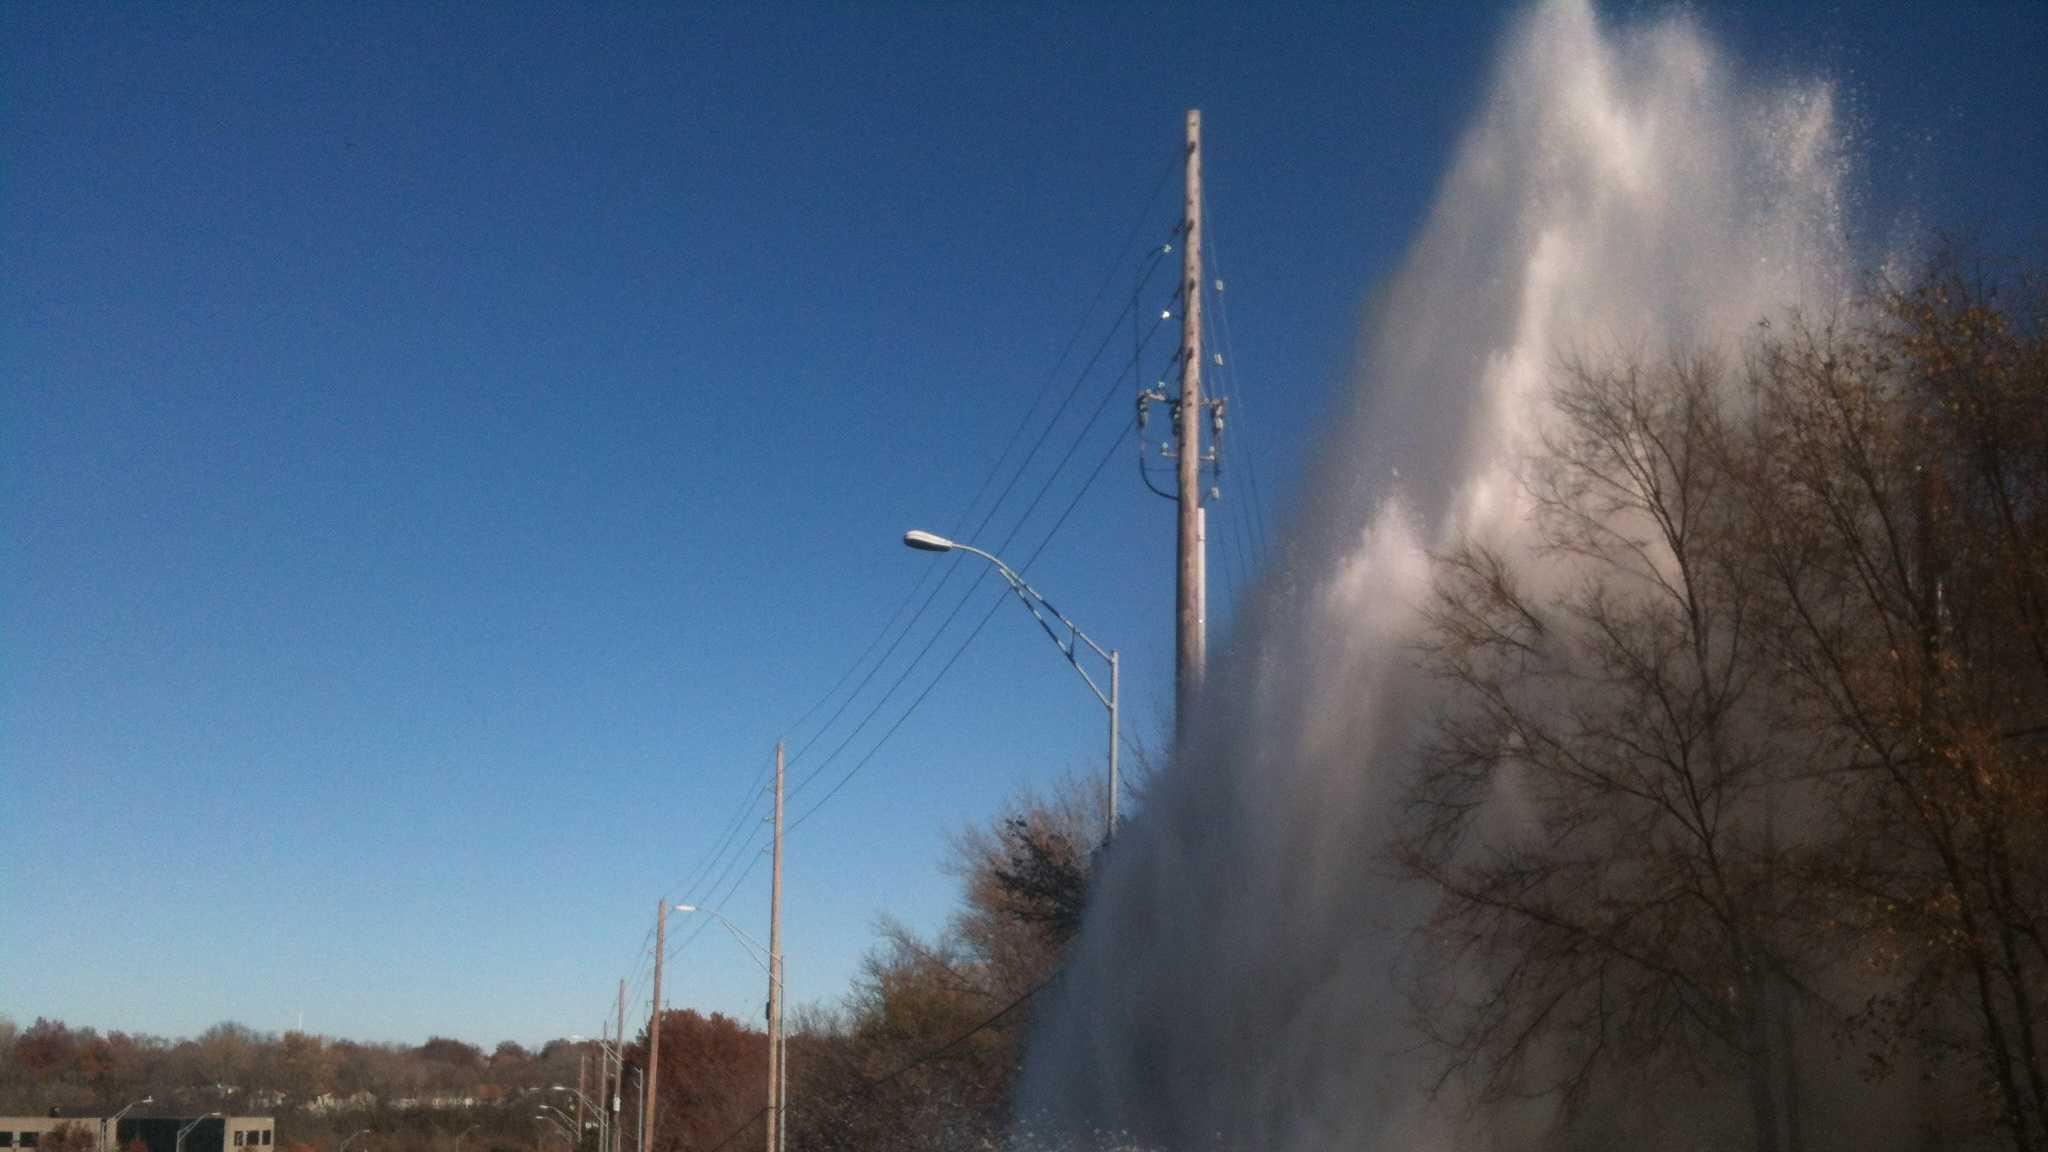 95th Street and Wornall Road water main break